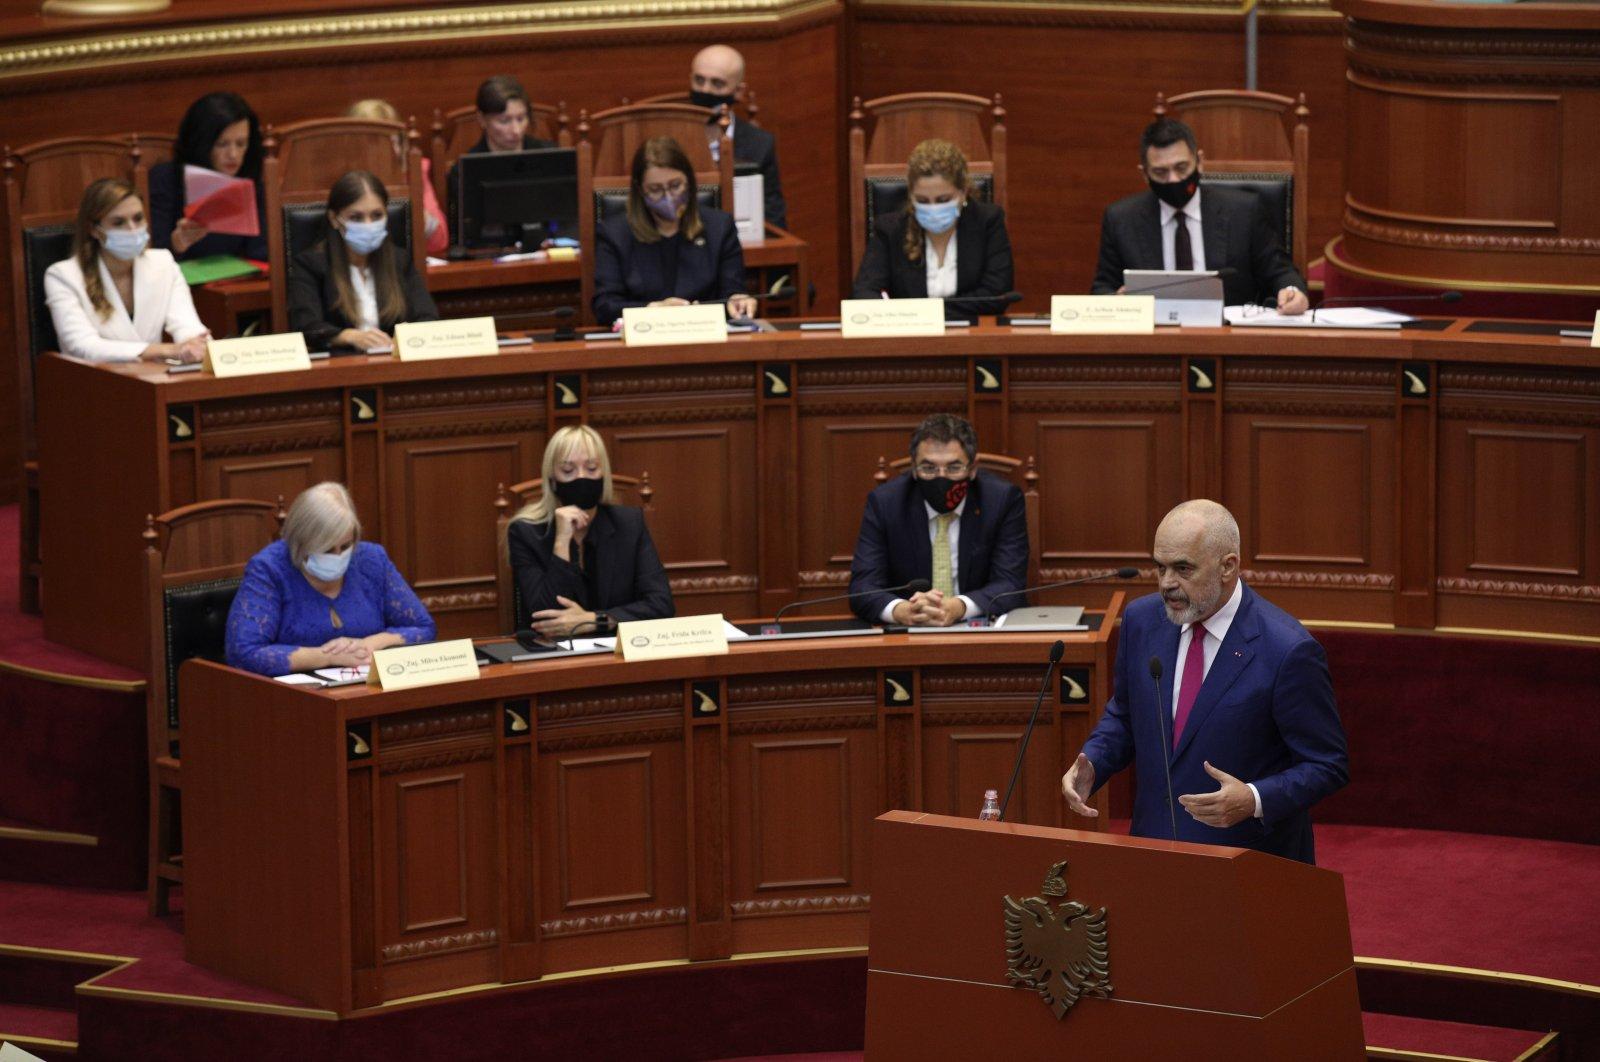 Albanian Prime Minister Edi Rama speaks during a debate at Parliament in Tirana, Albania, Sept. 16, 2021. (AP Photo)